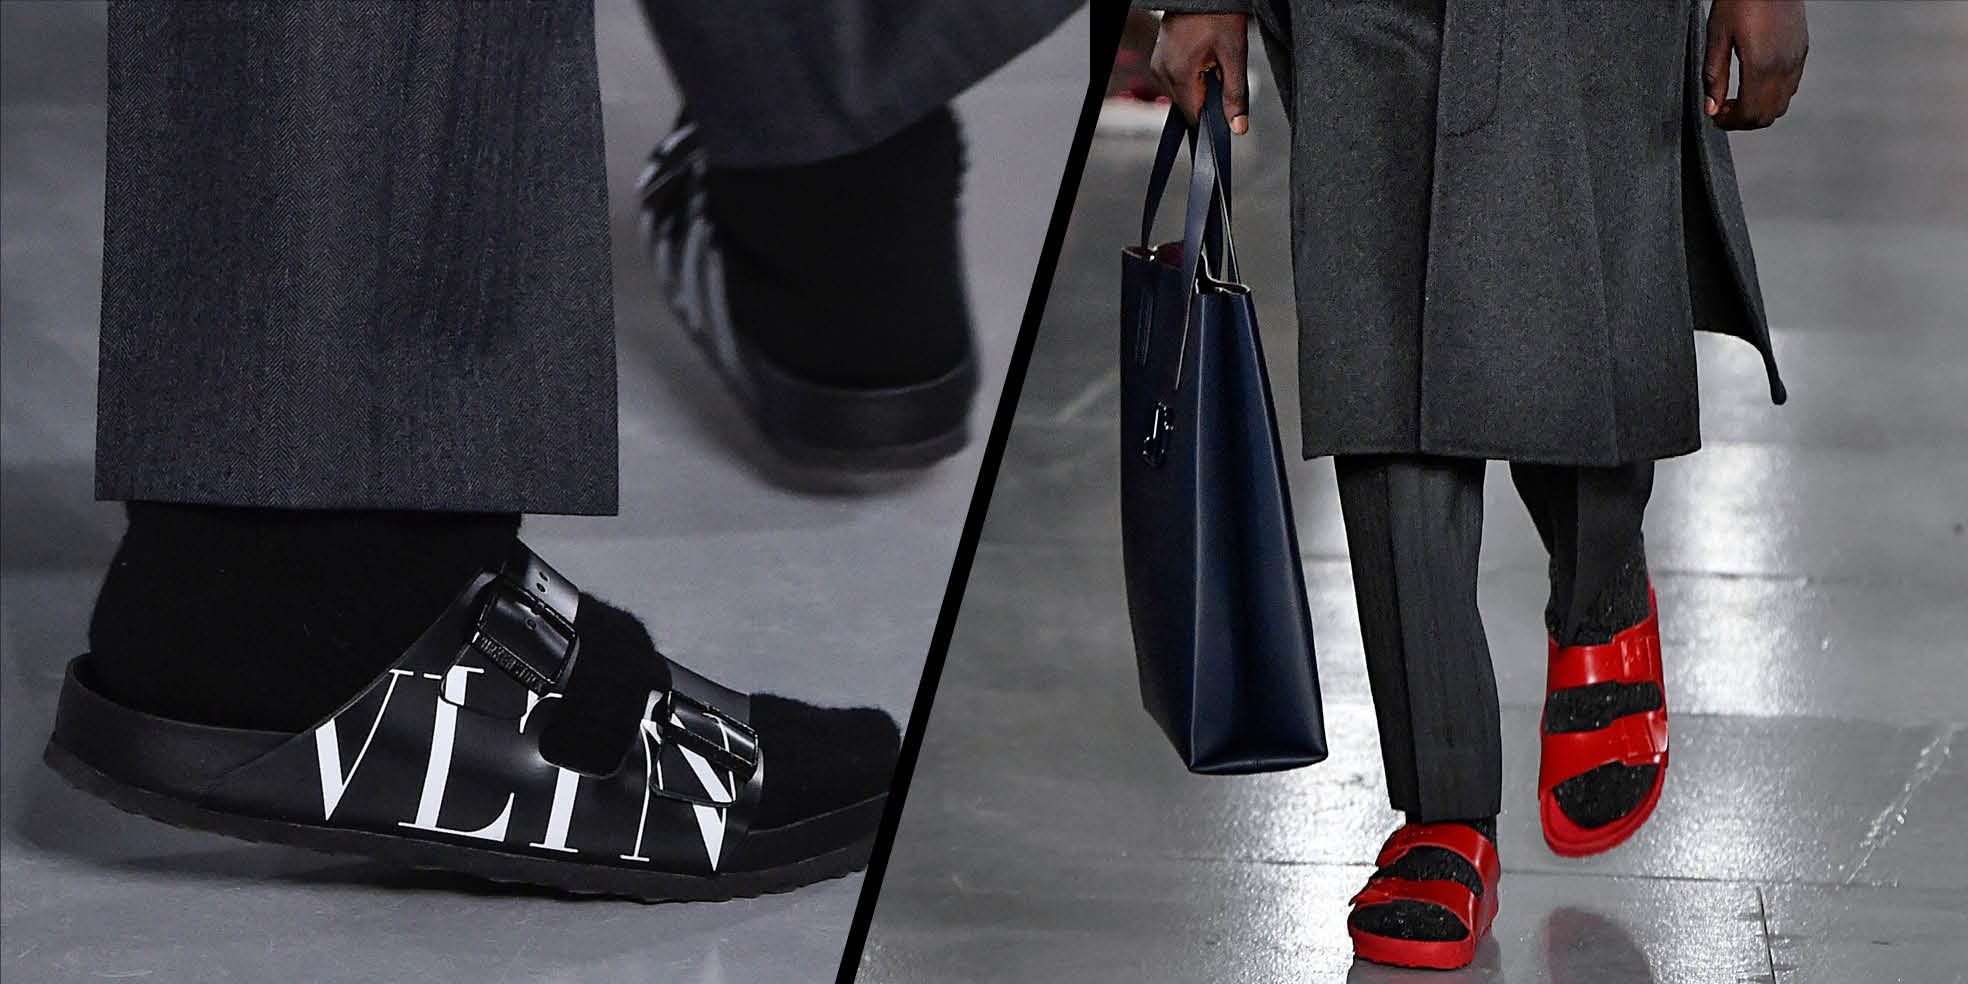 Valentino Has Given Birkenstocks A High-Fashion Spin